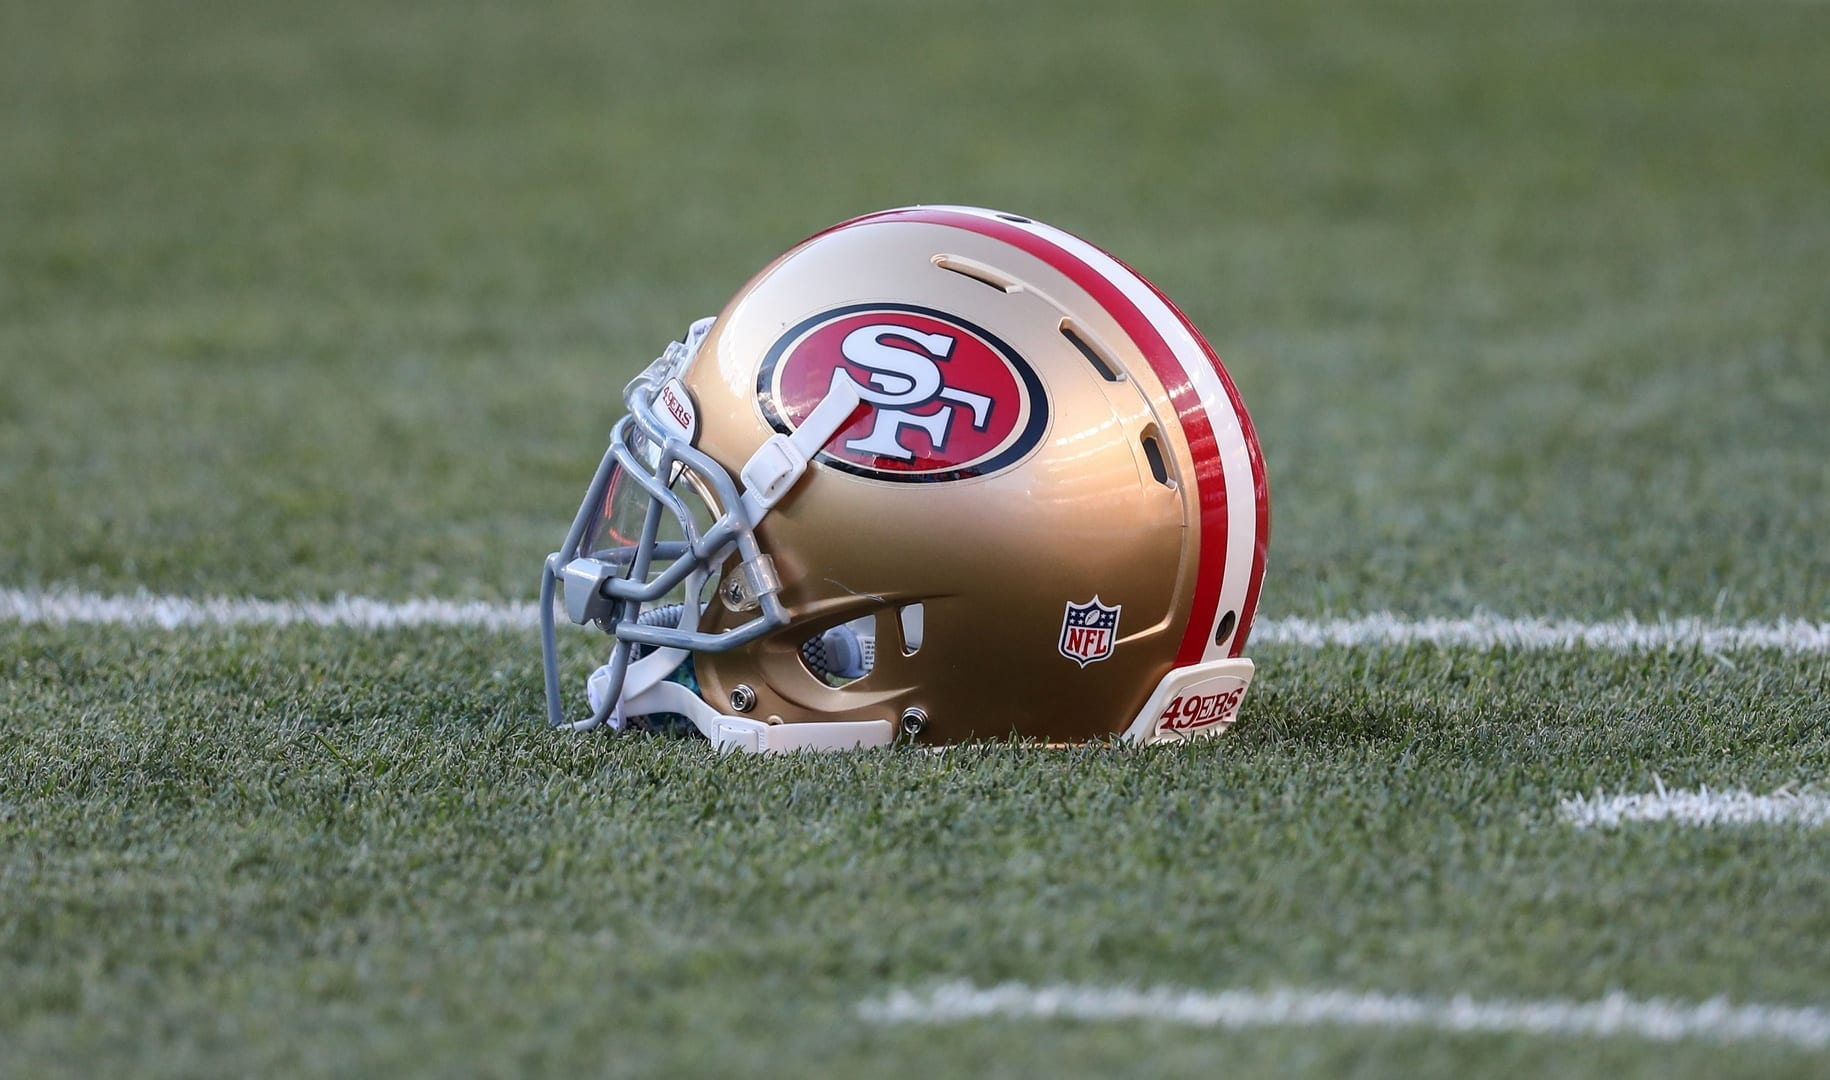 49ers-helmet